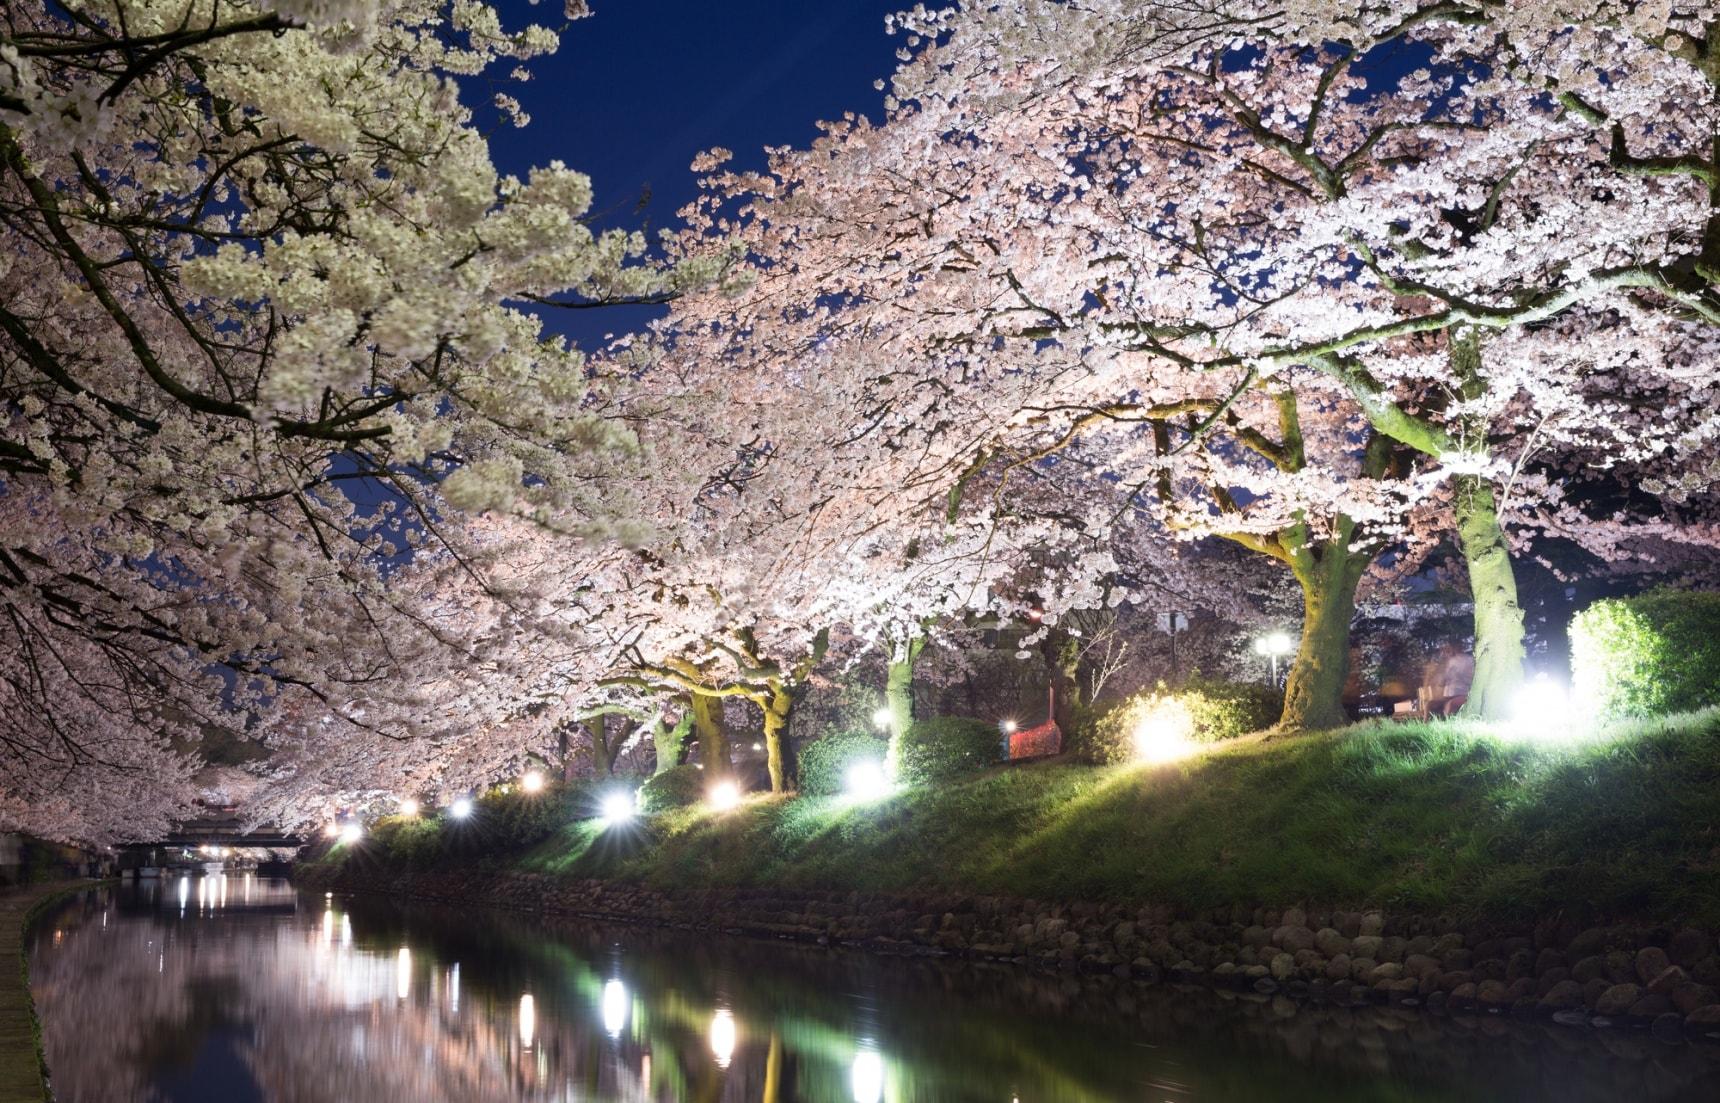 5 Must-See Cherry Blossom Sites in Hokuriku